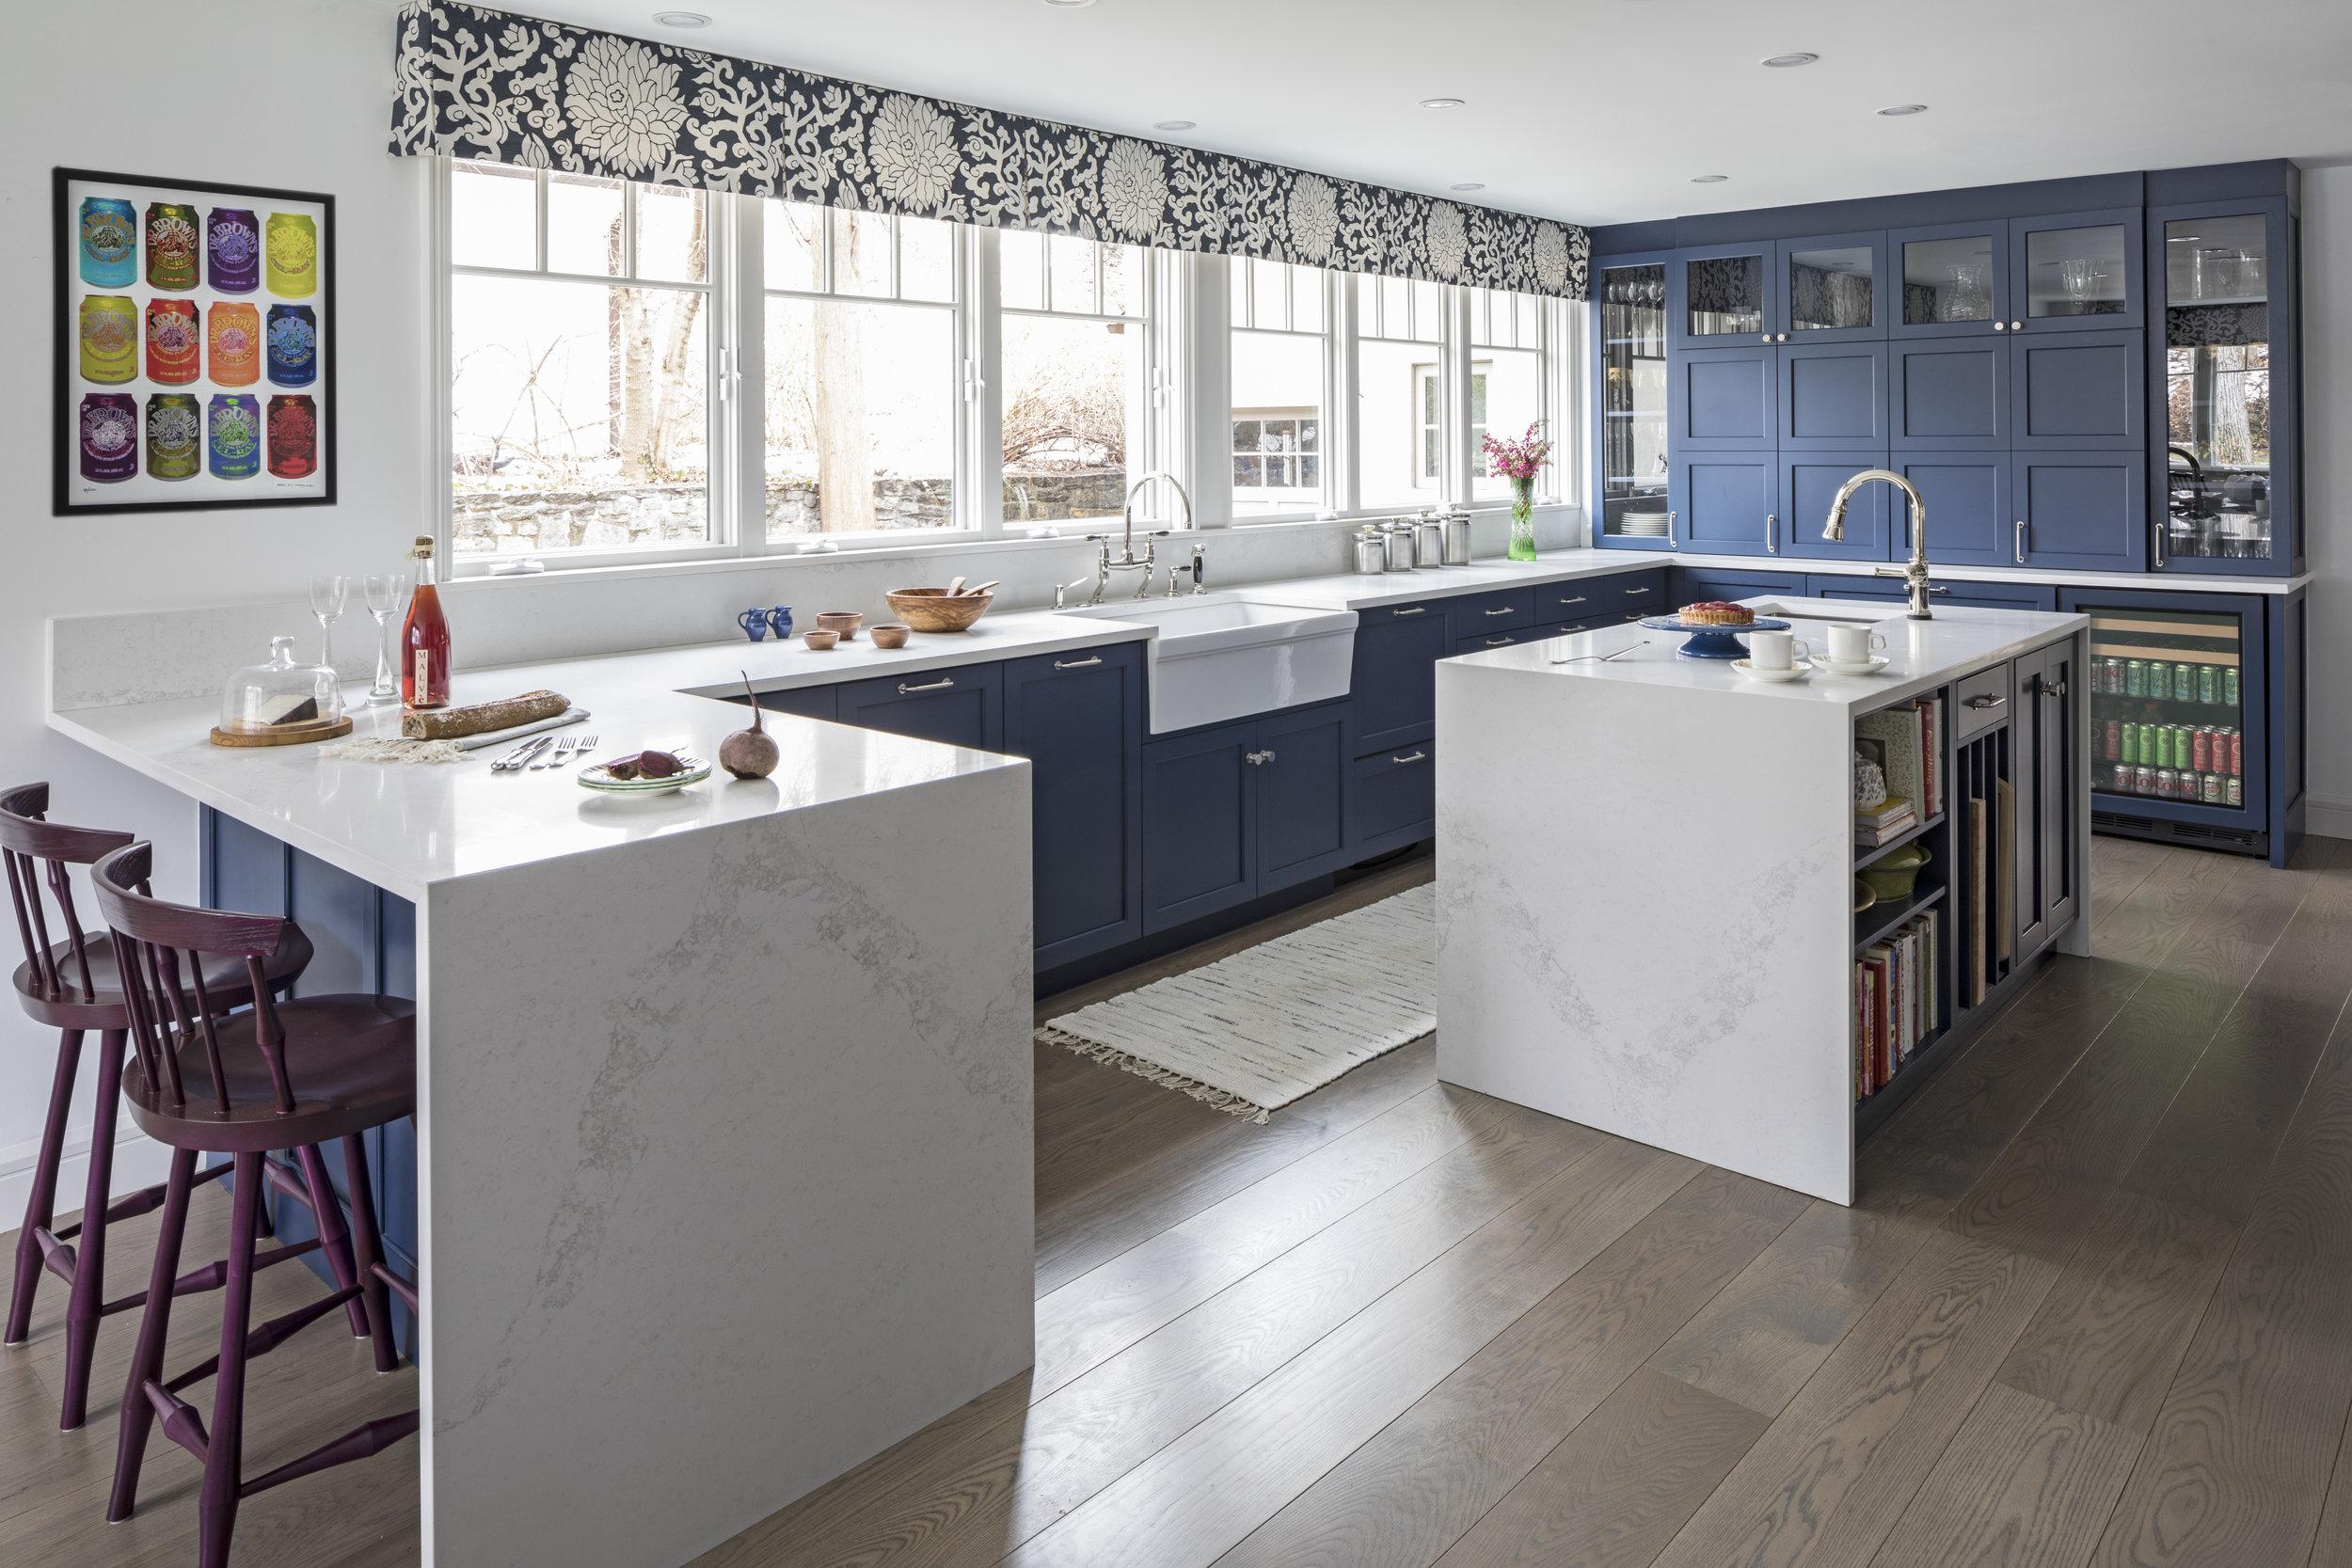 Blue-Modern-Large-Kitchen-Bronx-Ceasarstone-Countertops-Custom-Cabinets-Jmorris-Design-Interior-Designer-Brooklyn-Online-Edesign.jpg